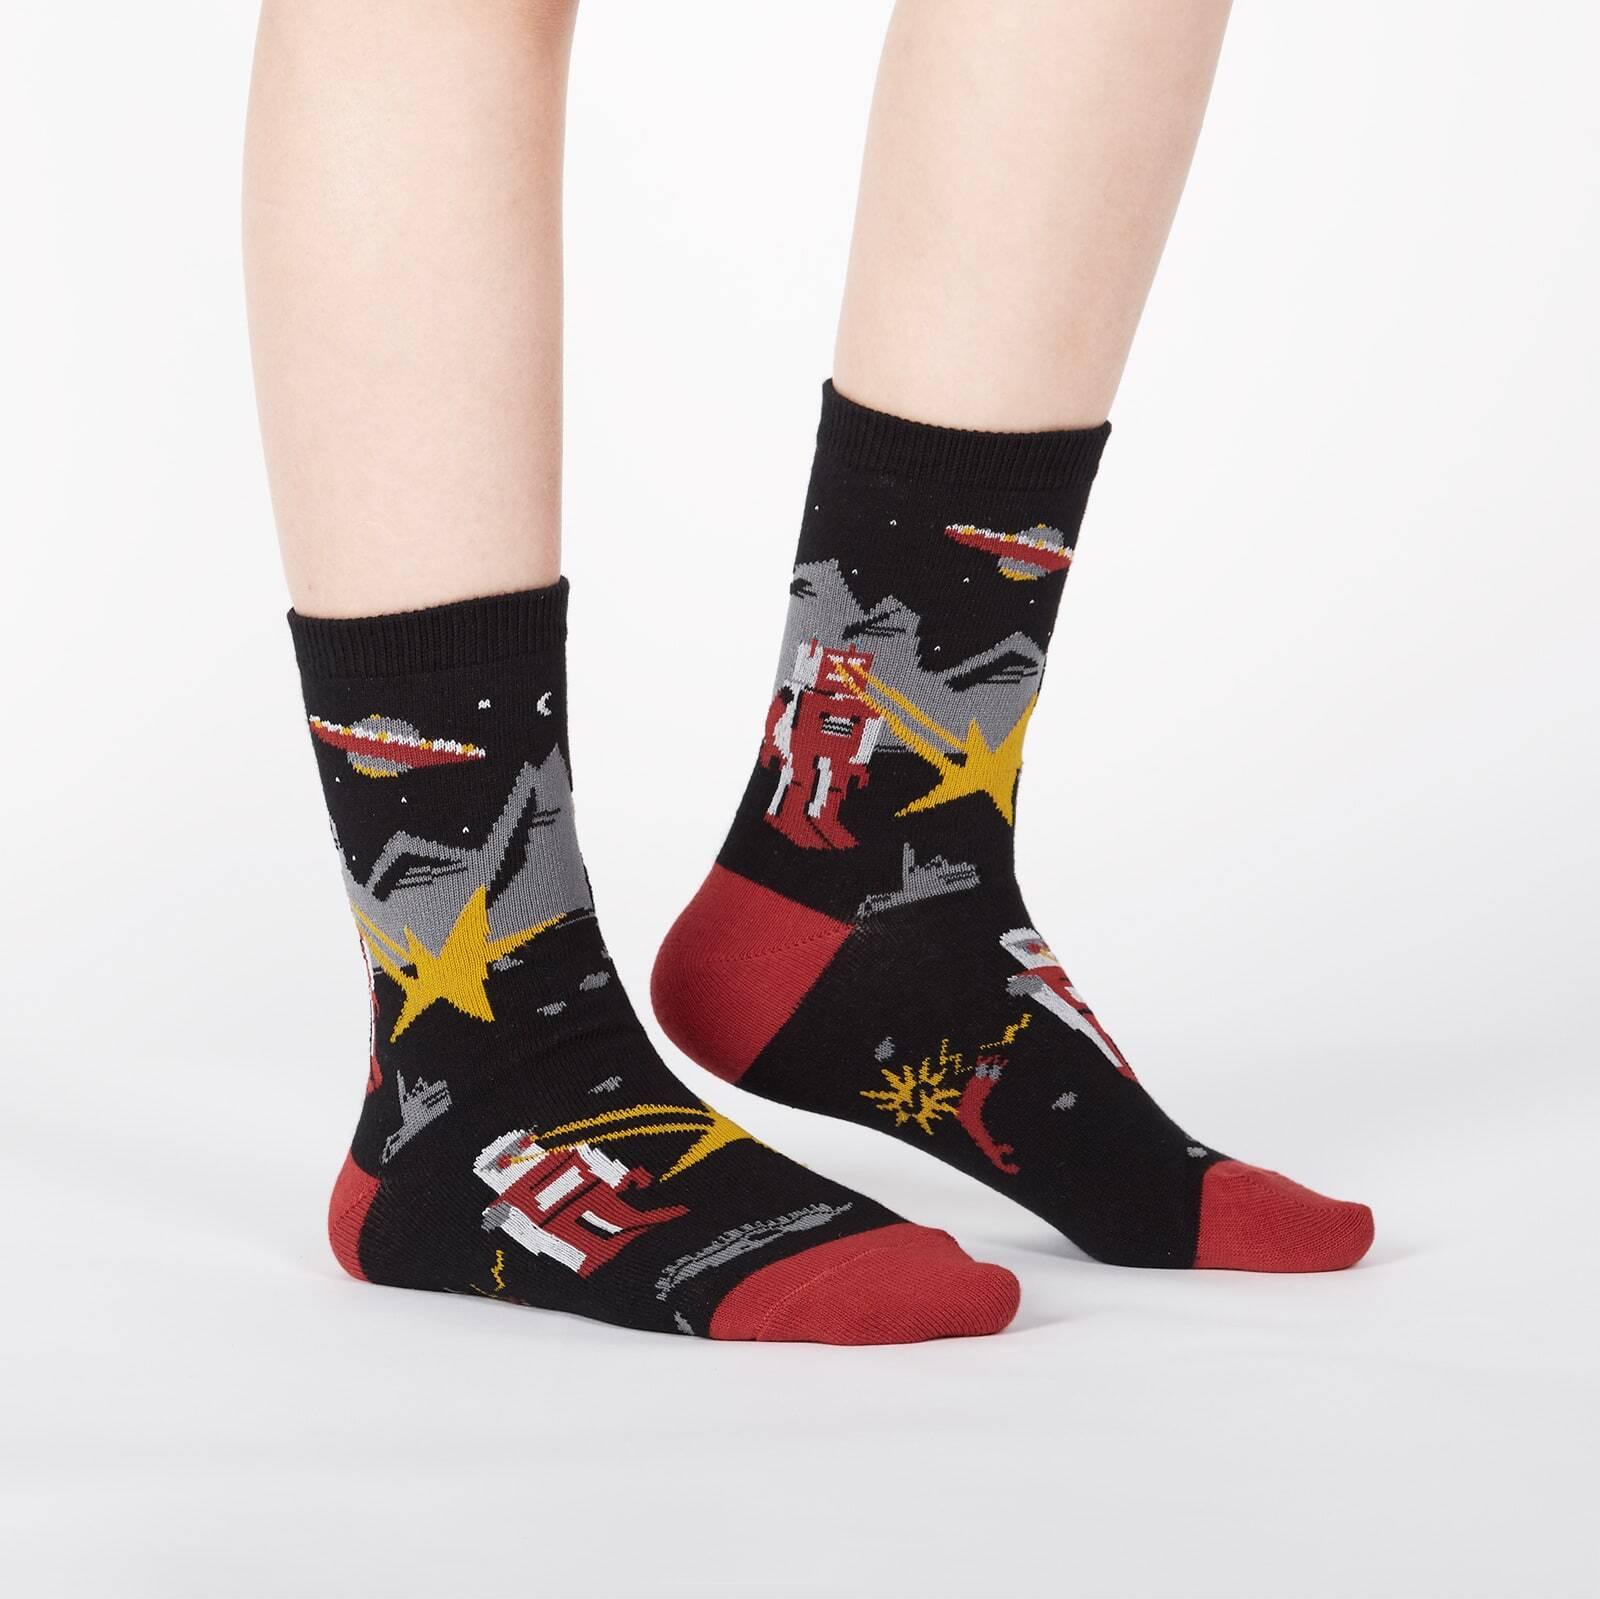 model wearing Zap! Zap! - Destructive Robots Dogs and UFOs Crew Socks Black - Junior's